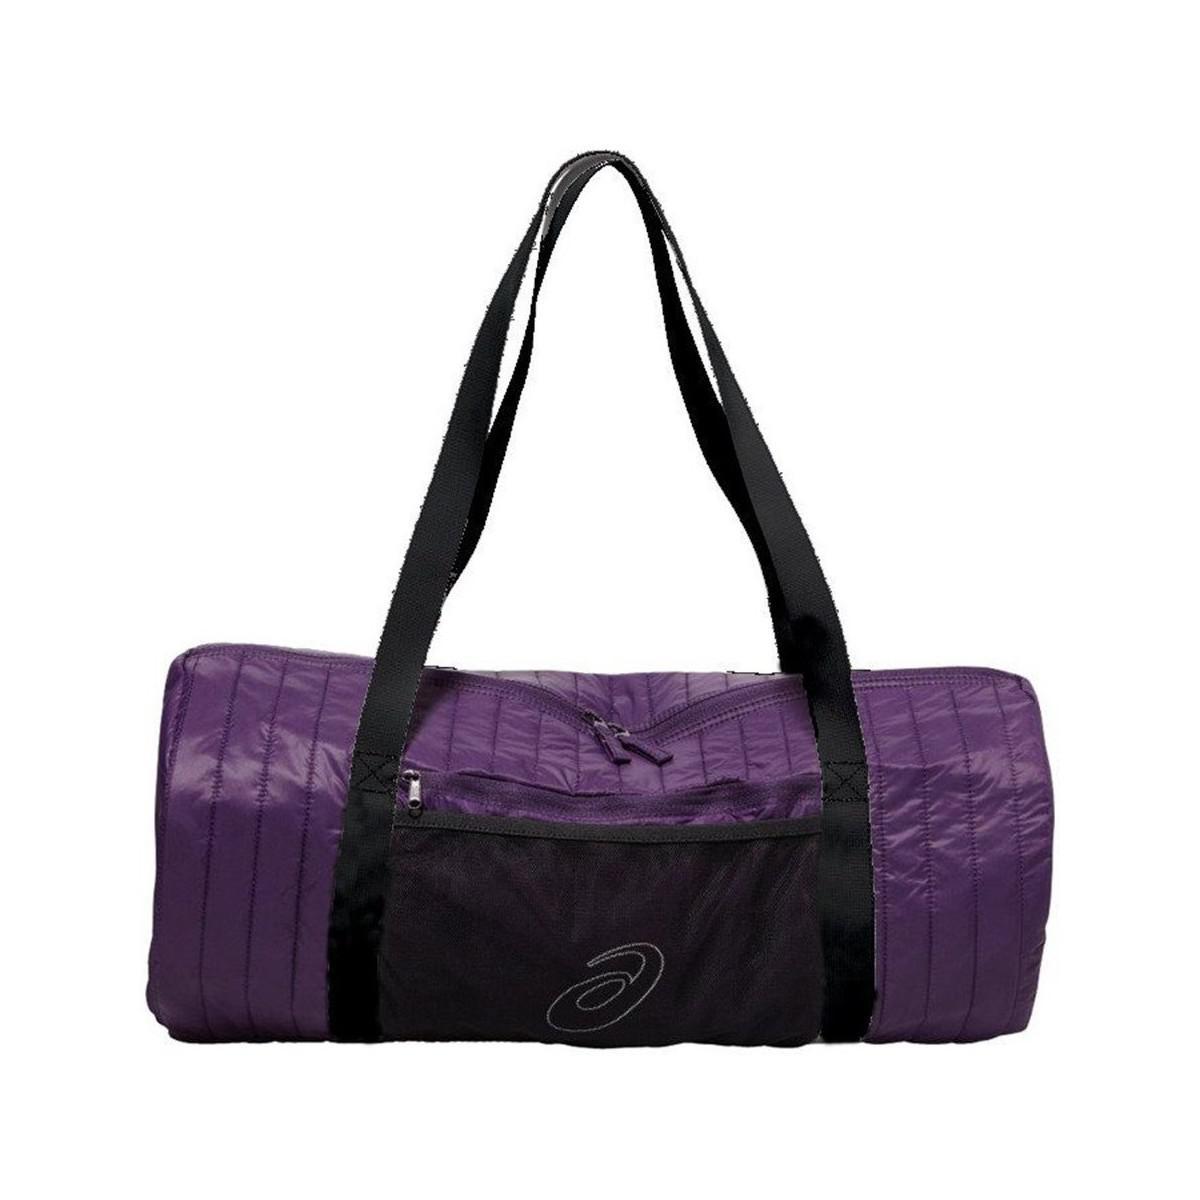 c8996c3a64 Asics Training Essentials Foldaway Bag Men s Sports Bag In Purple in ...